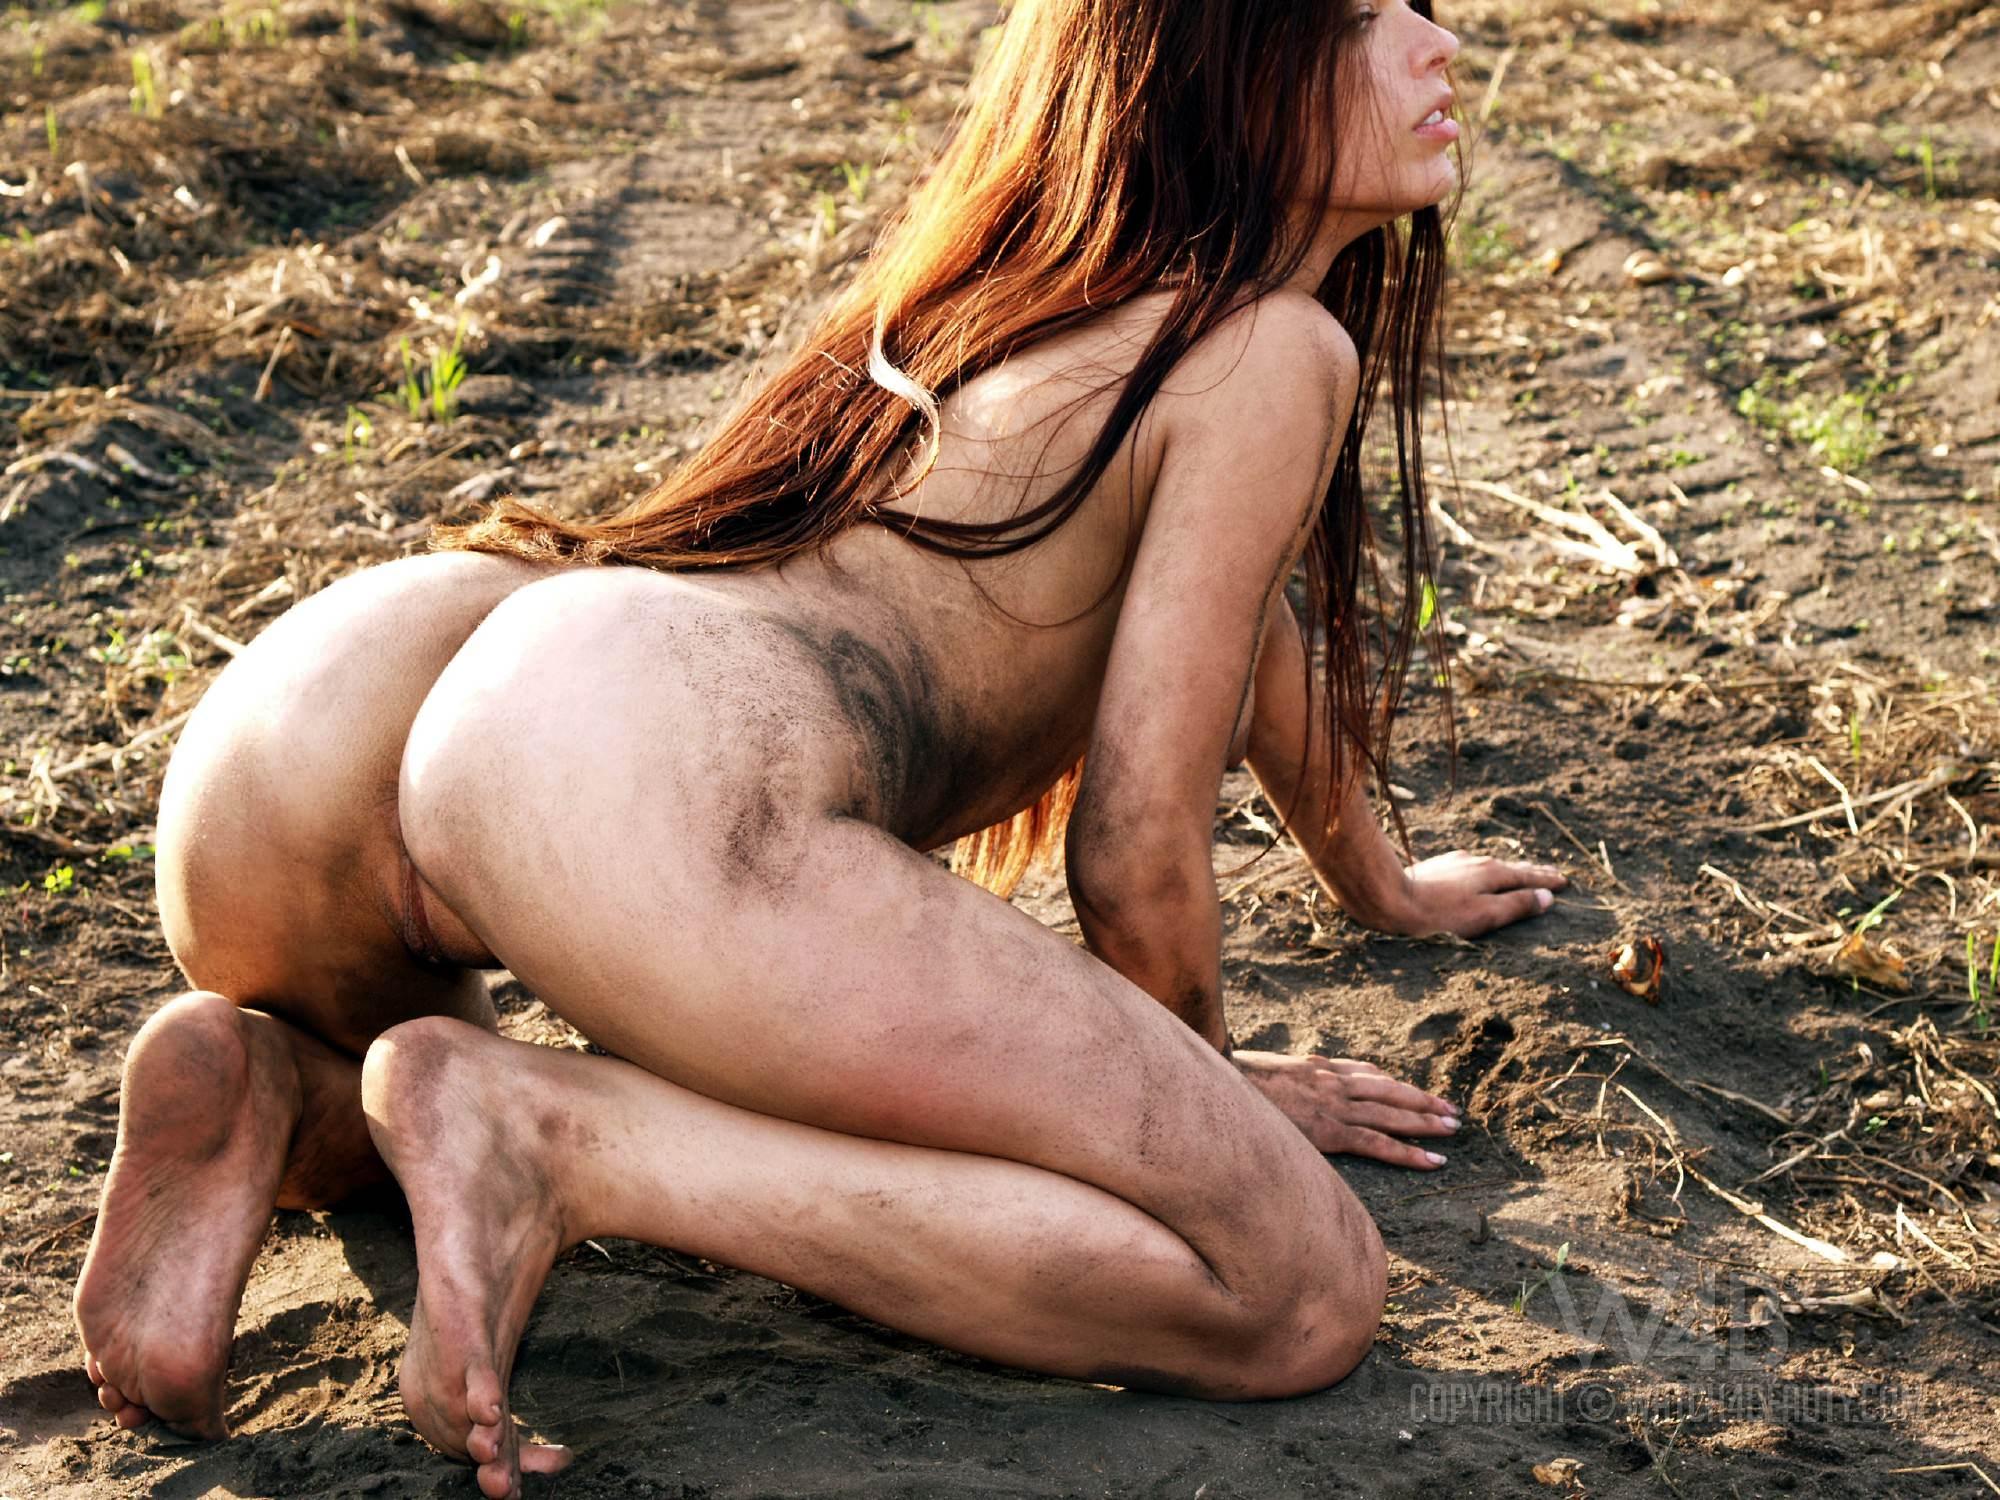 Фото голая девушка в грязи 2 фотография